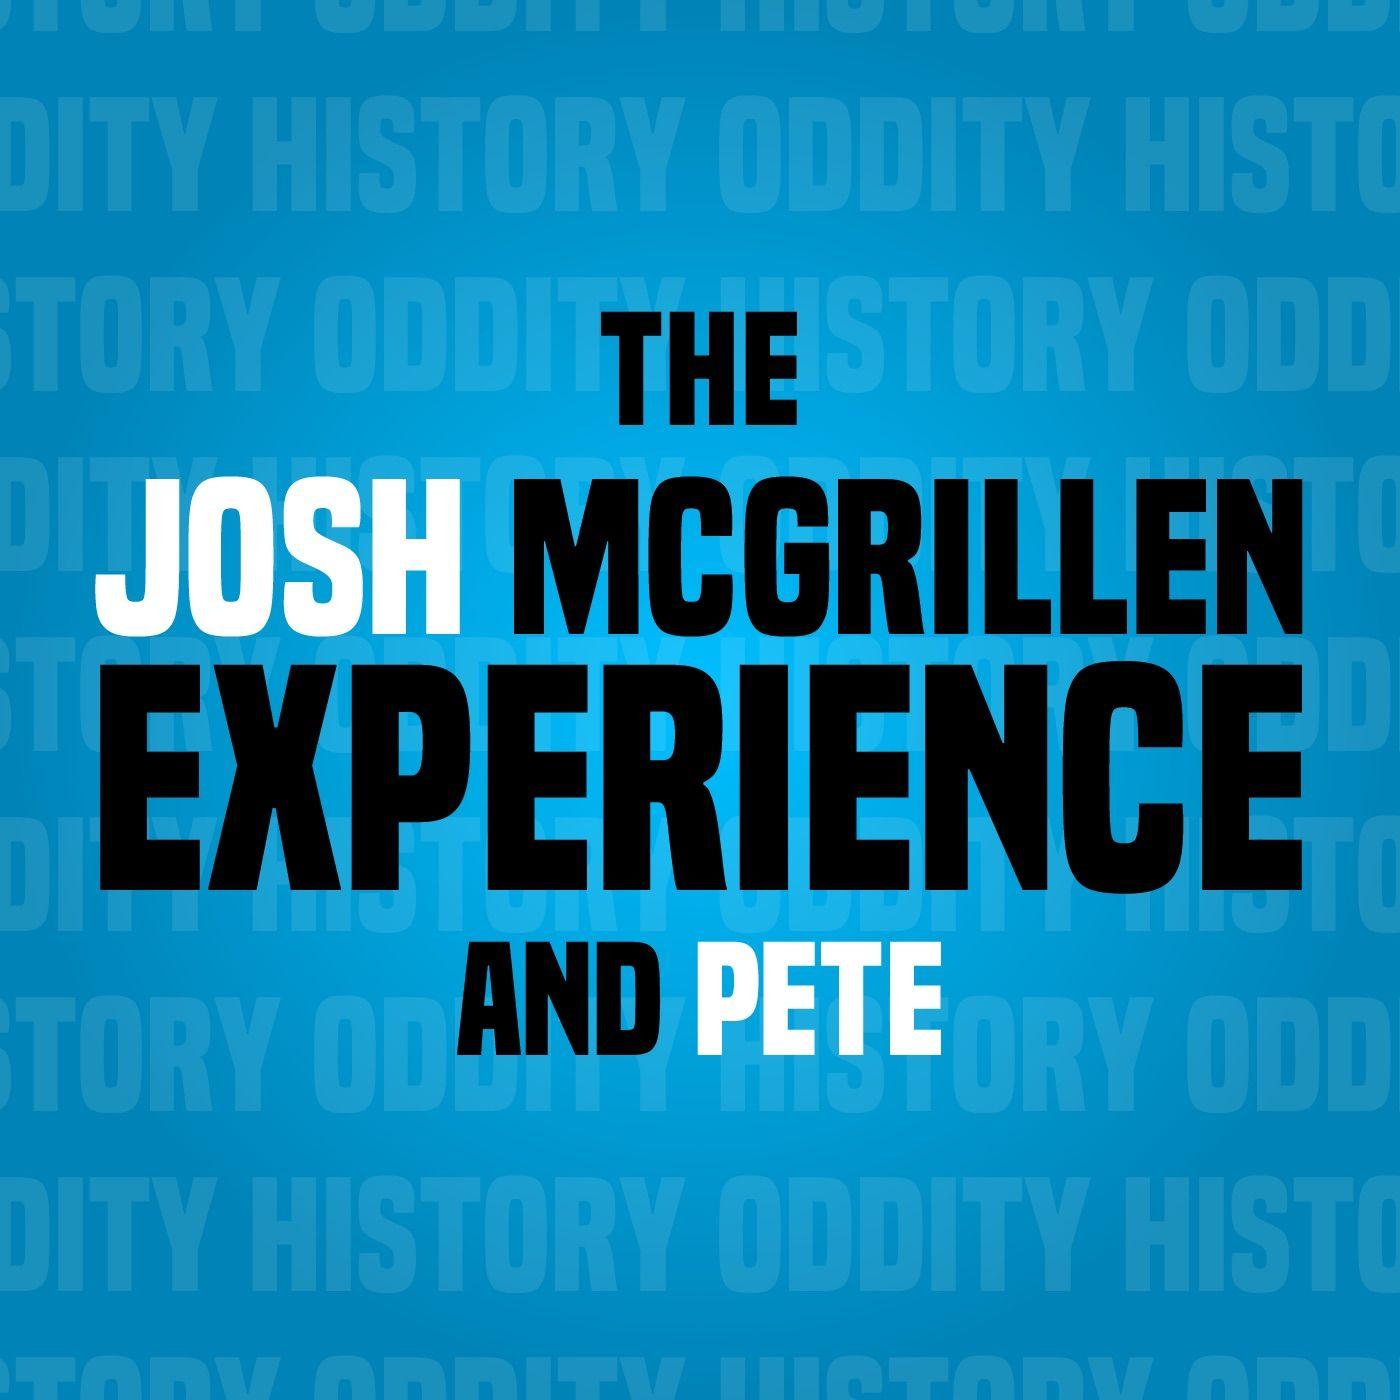 The Josh McGrillen Experience & Pete - Episode 4